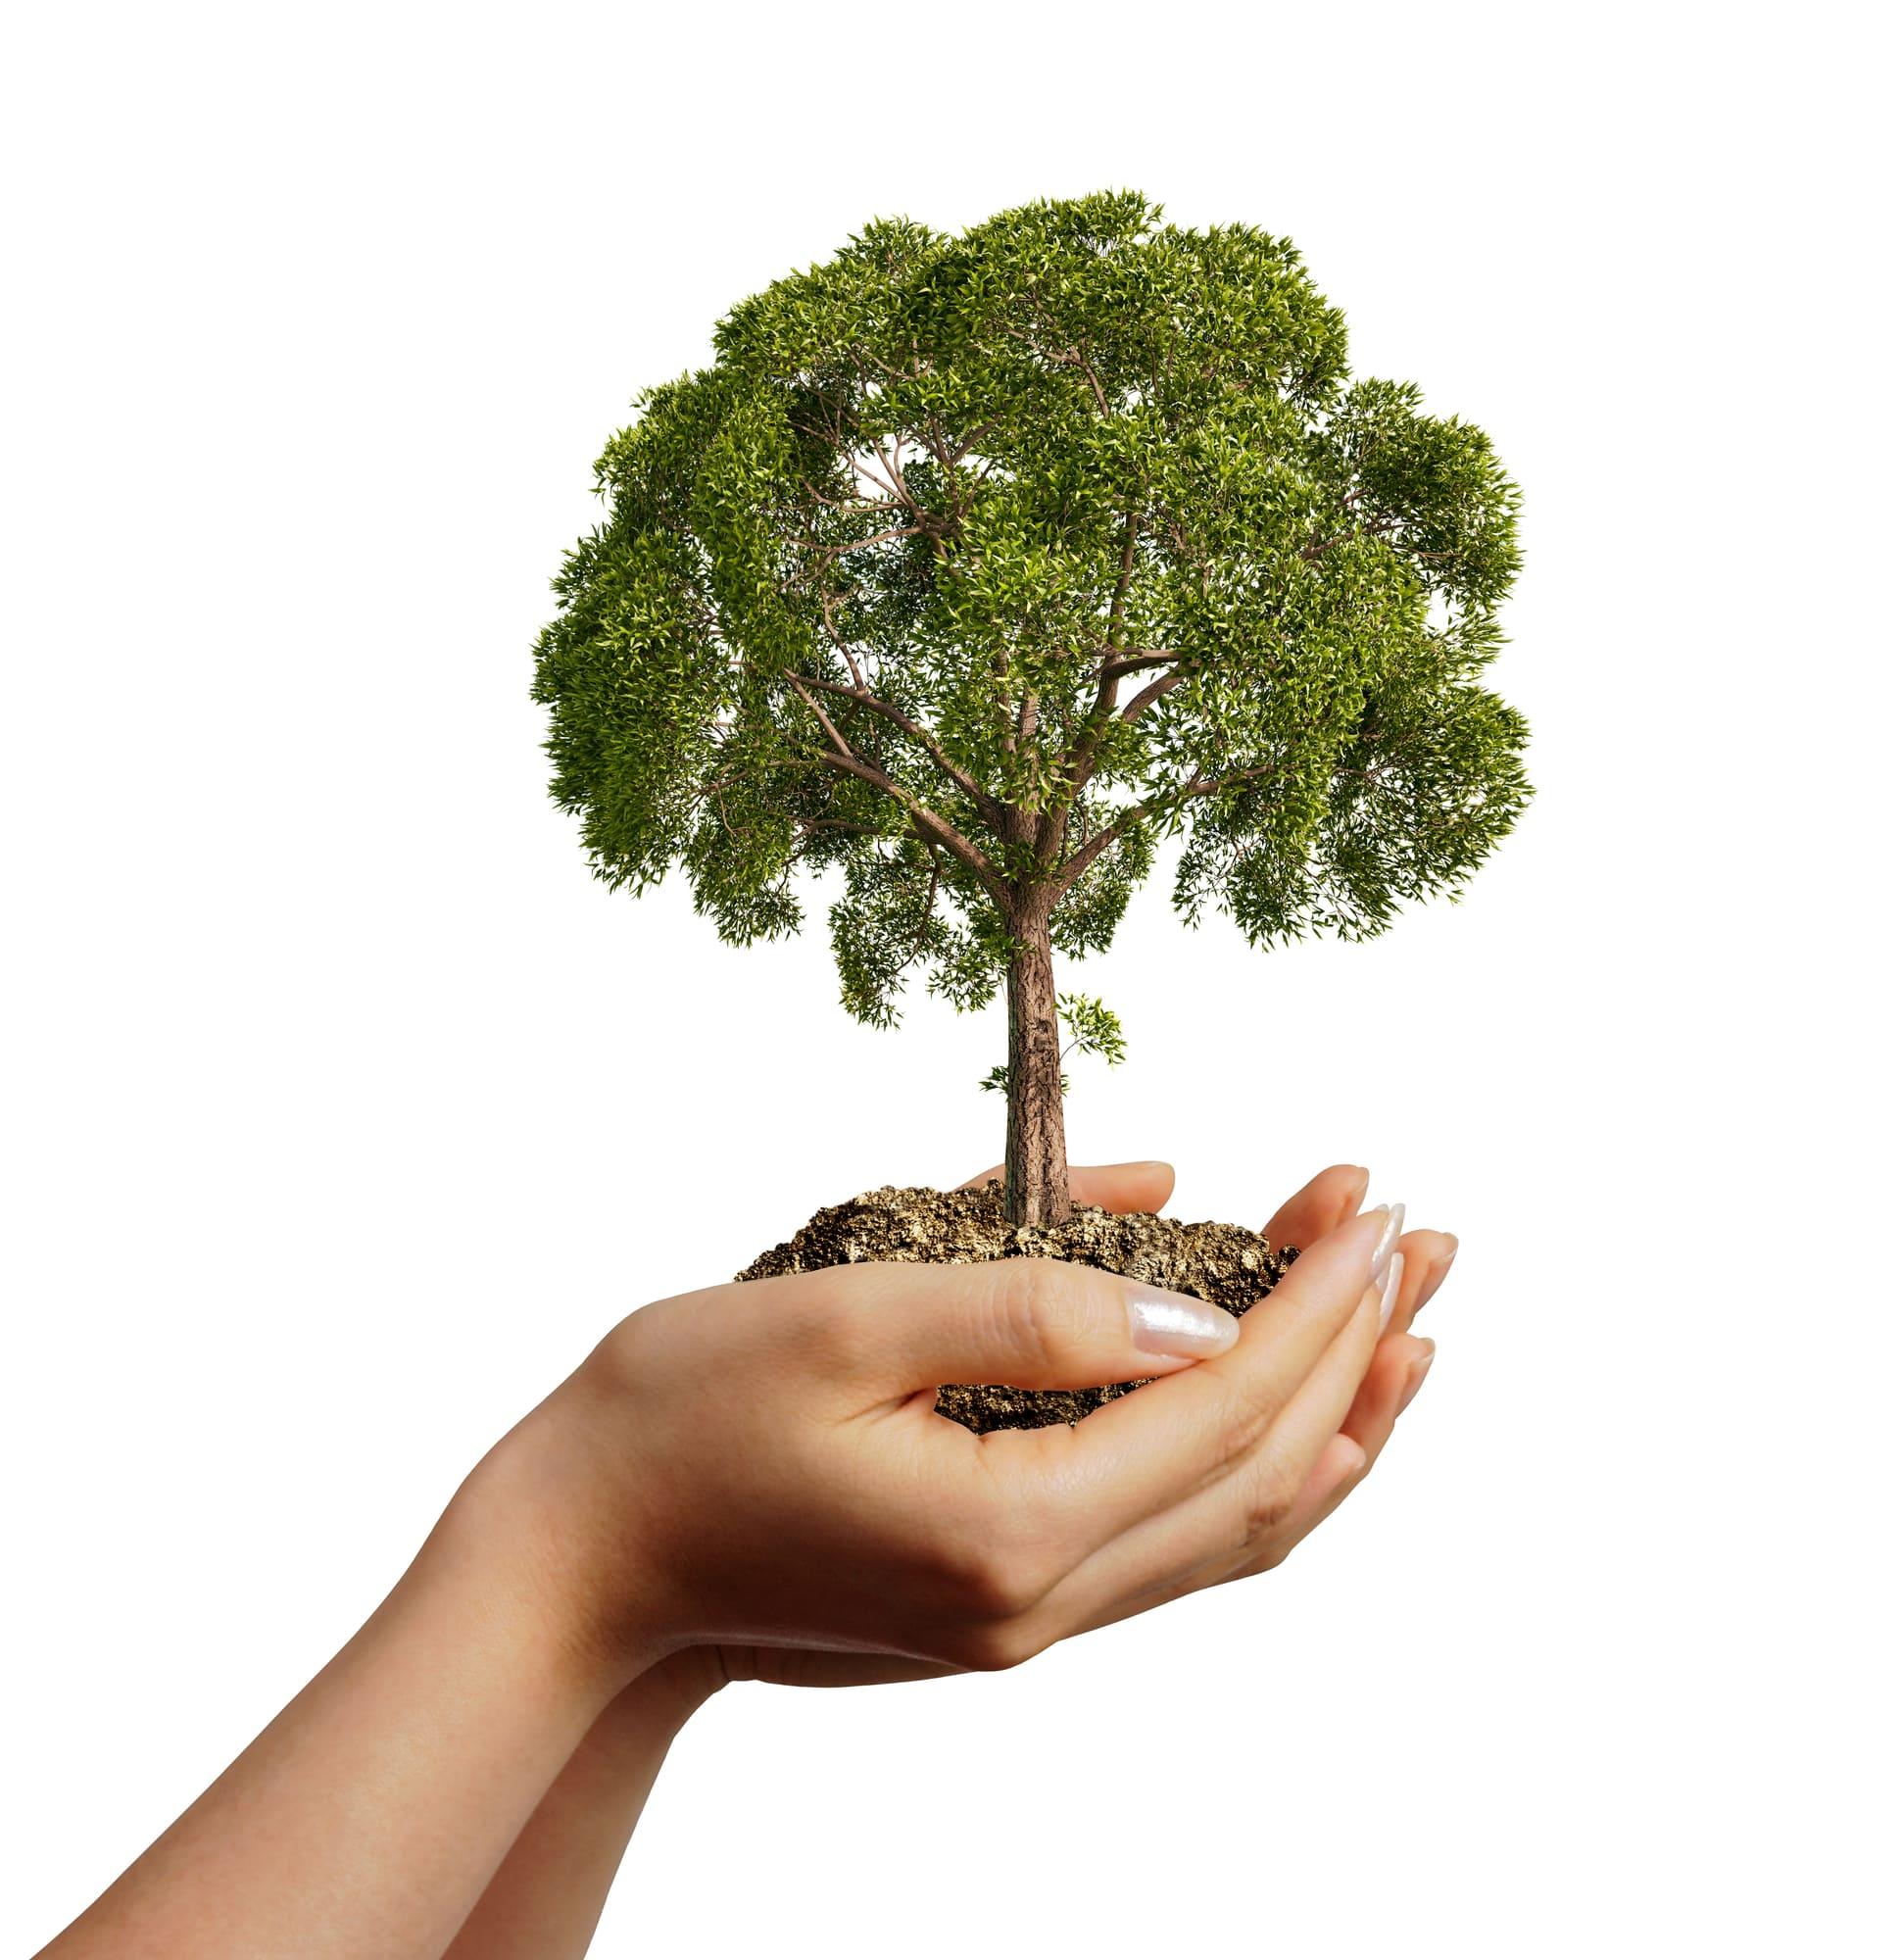 emergency tree care - Big Easy Tree Removal